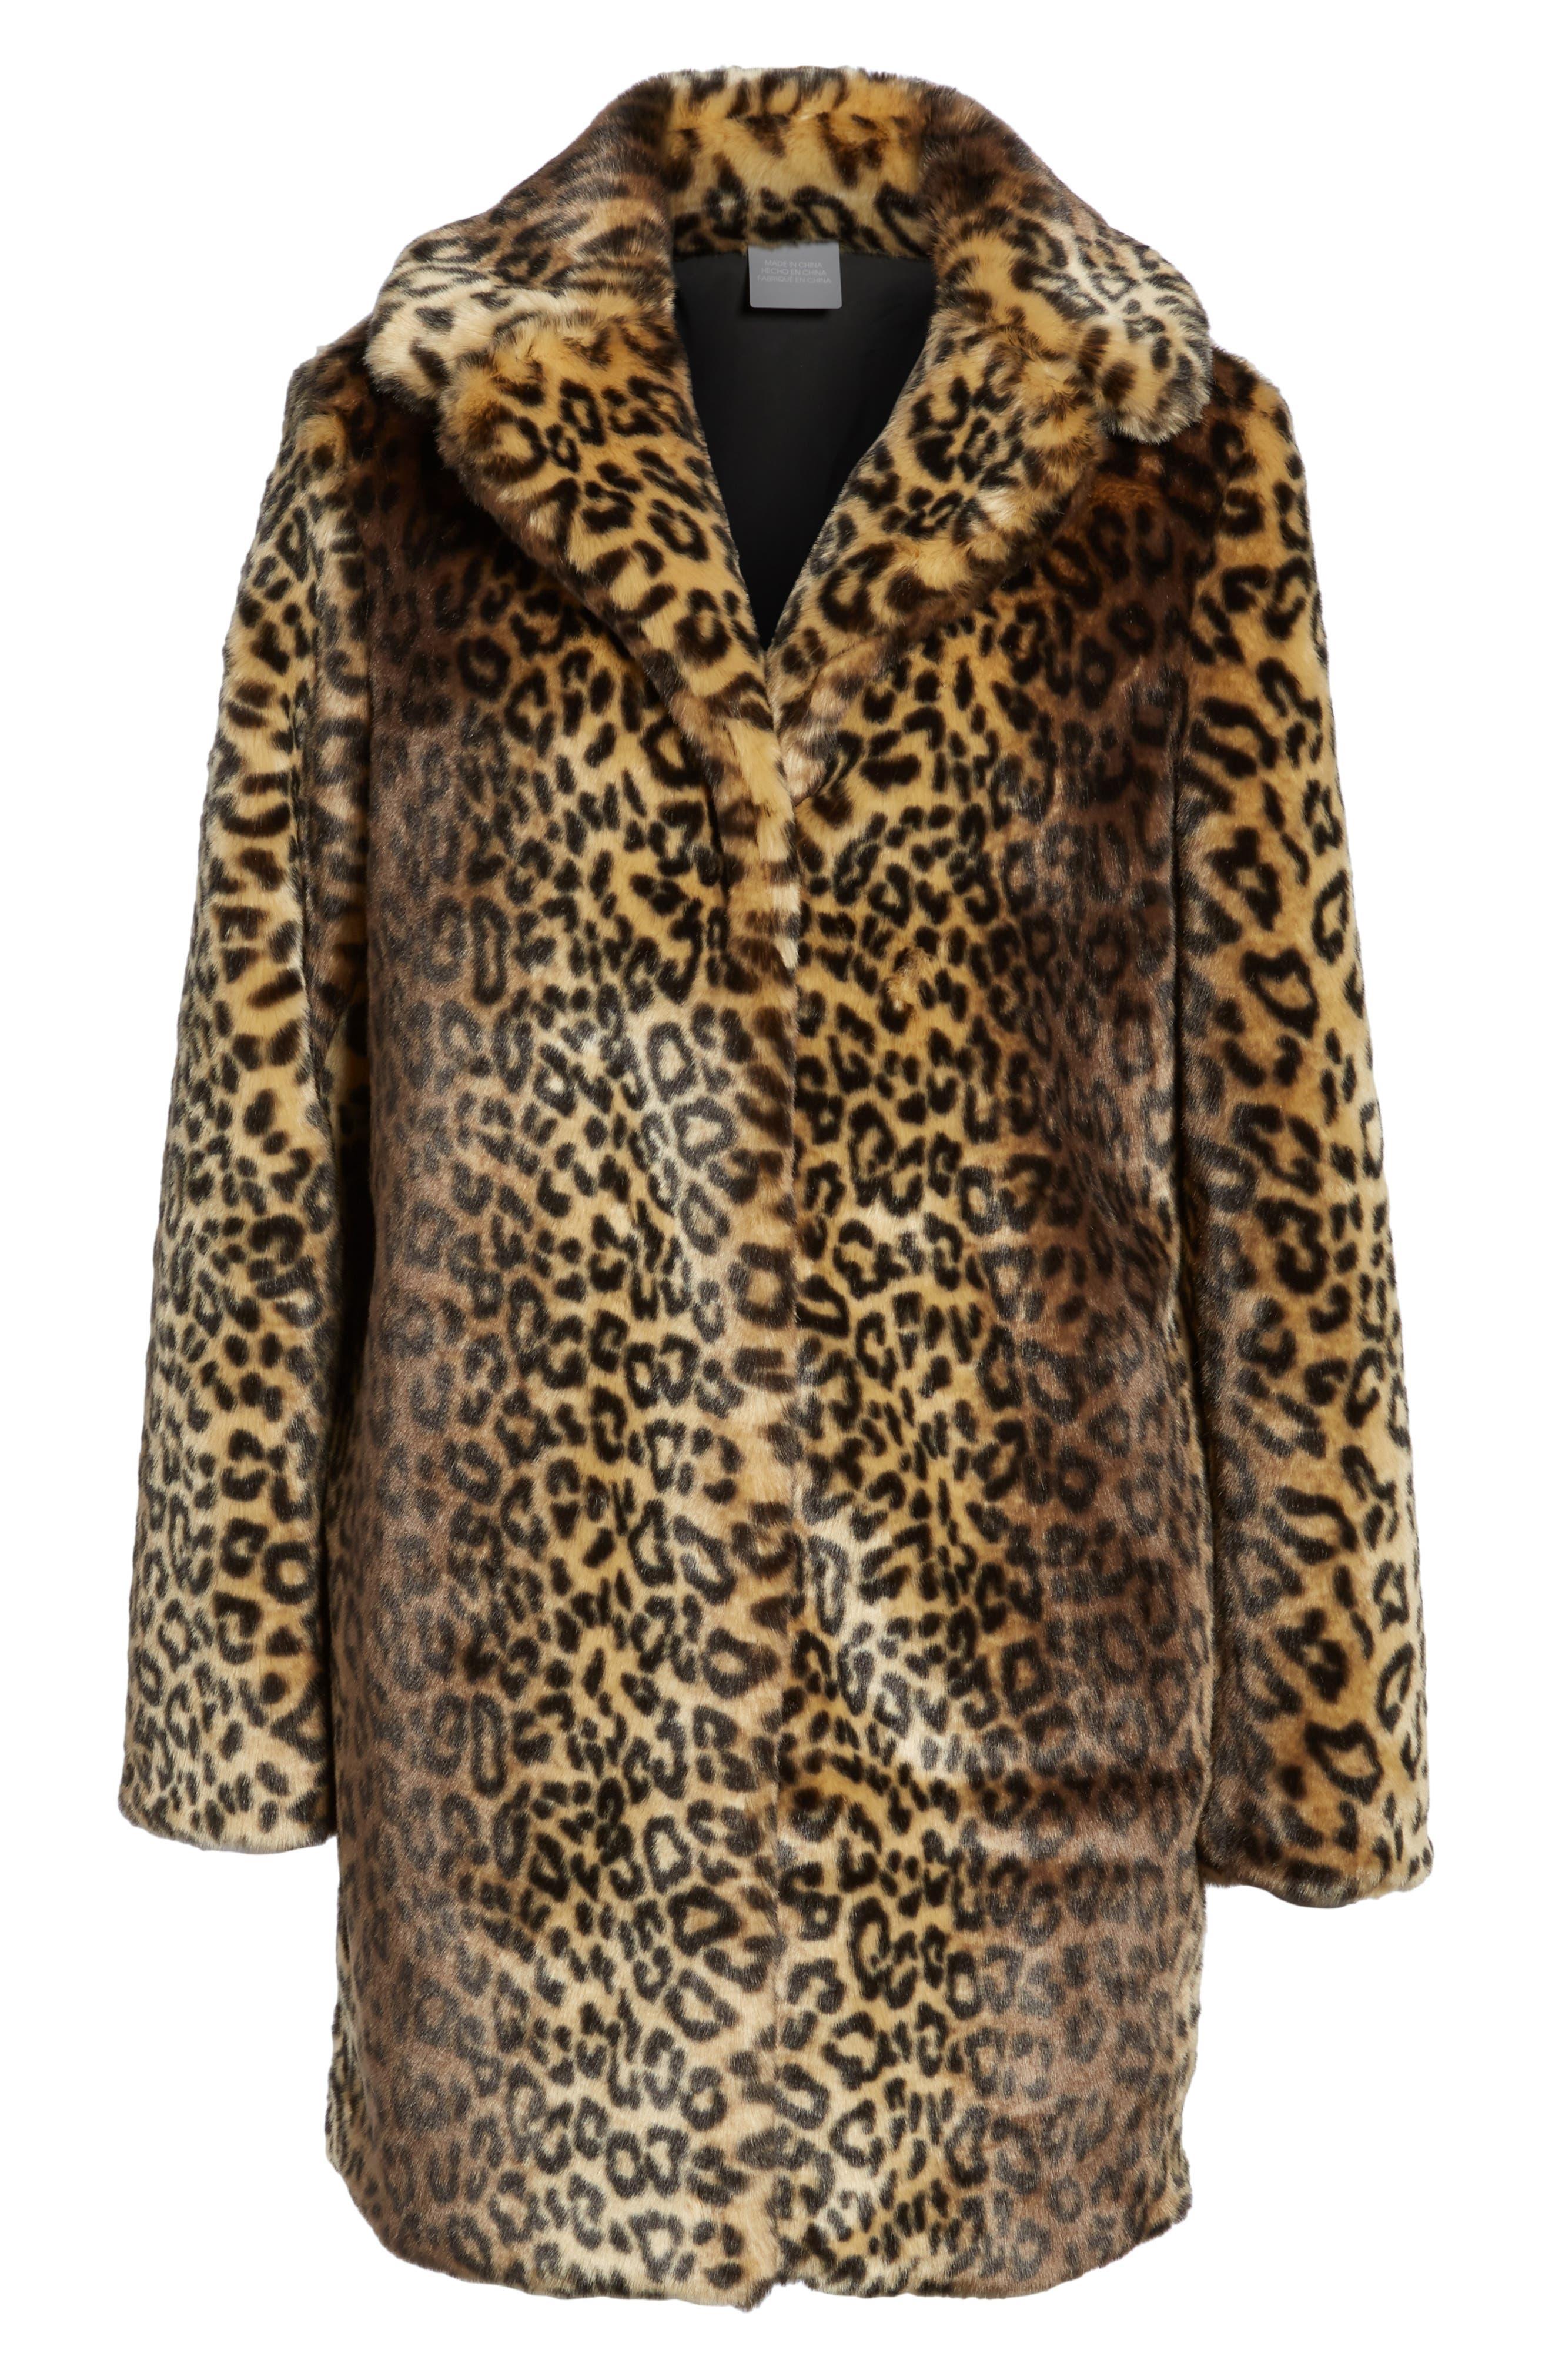 Reversible Cheetah Print Faux Fur Jacket,                             Alternate thumbnail 5, color,                             254